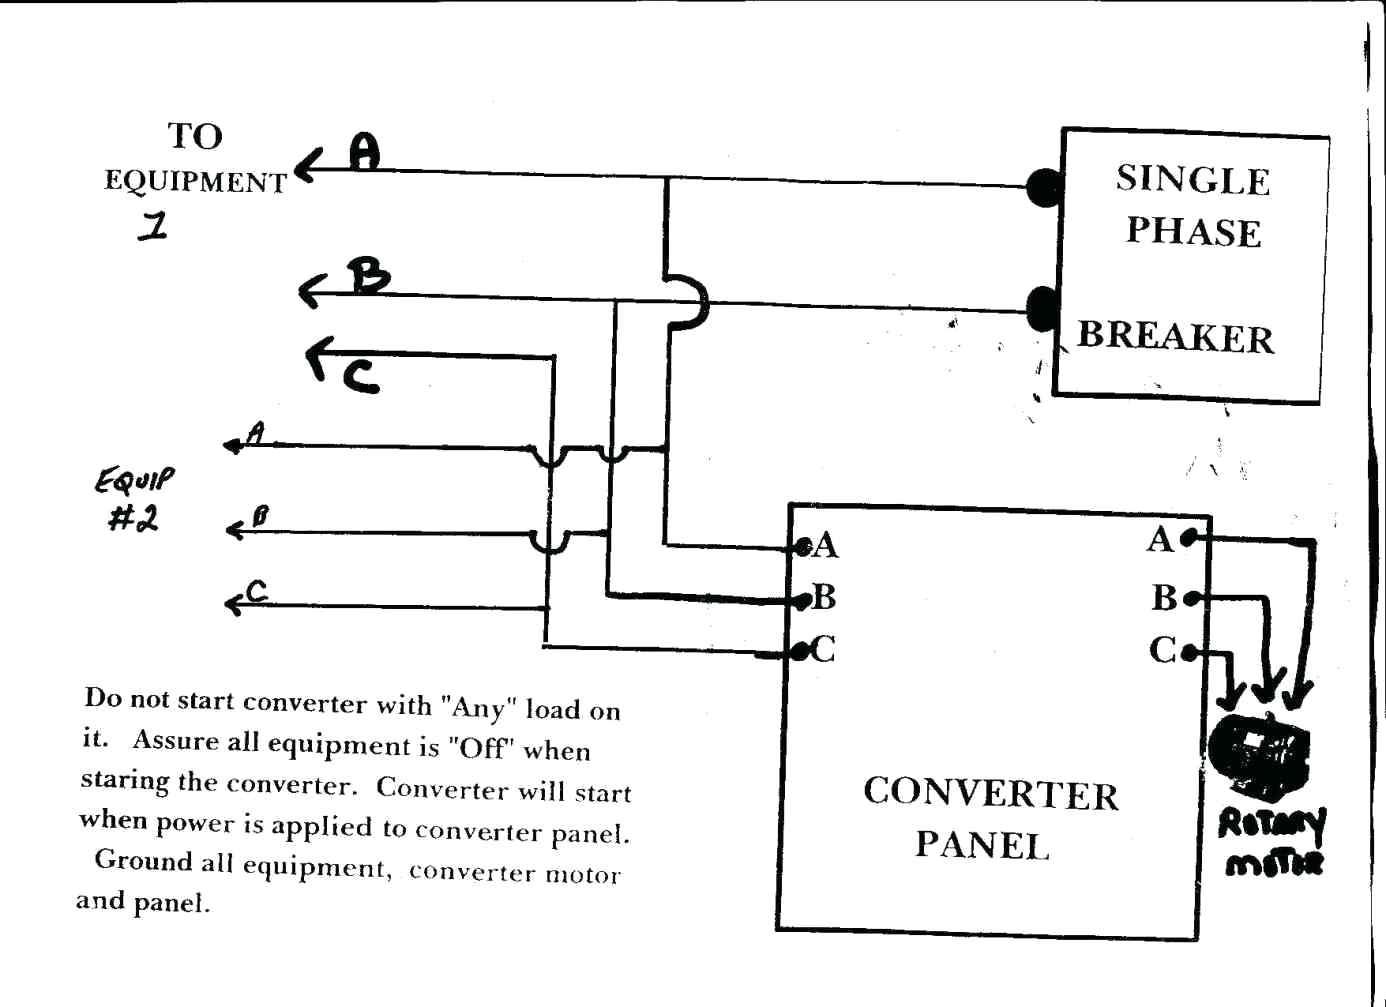 Square D Shunt Trip Breaker Wiring Diagram - Allove - Shunt Trip Breaker Wiring Diagram